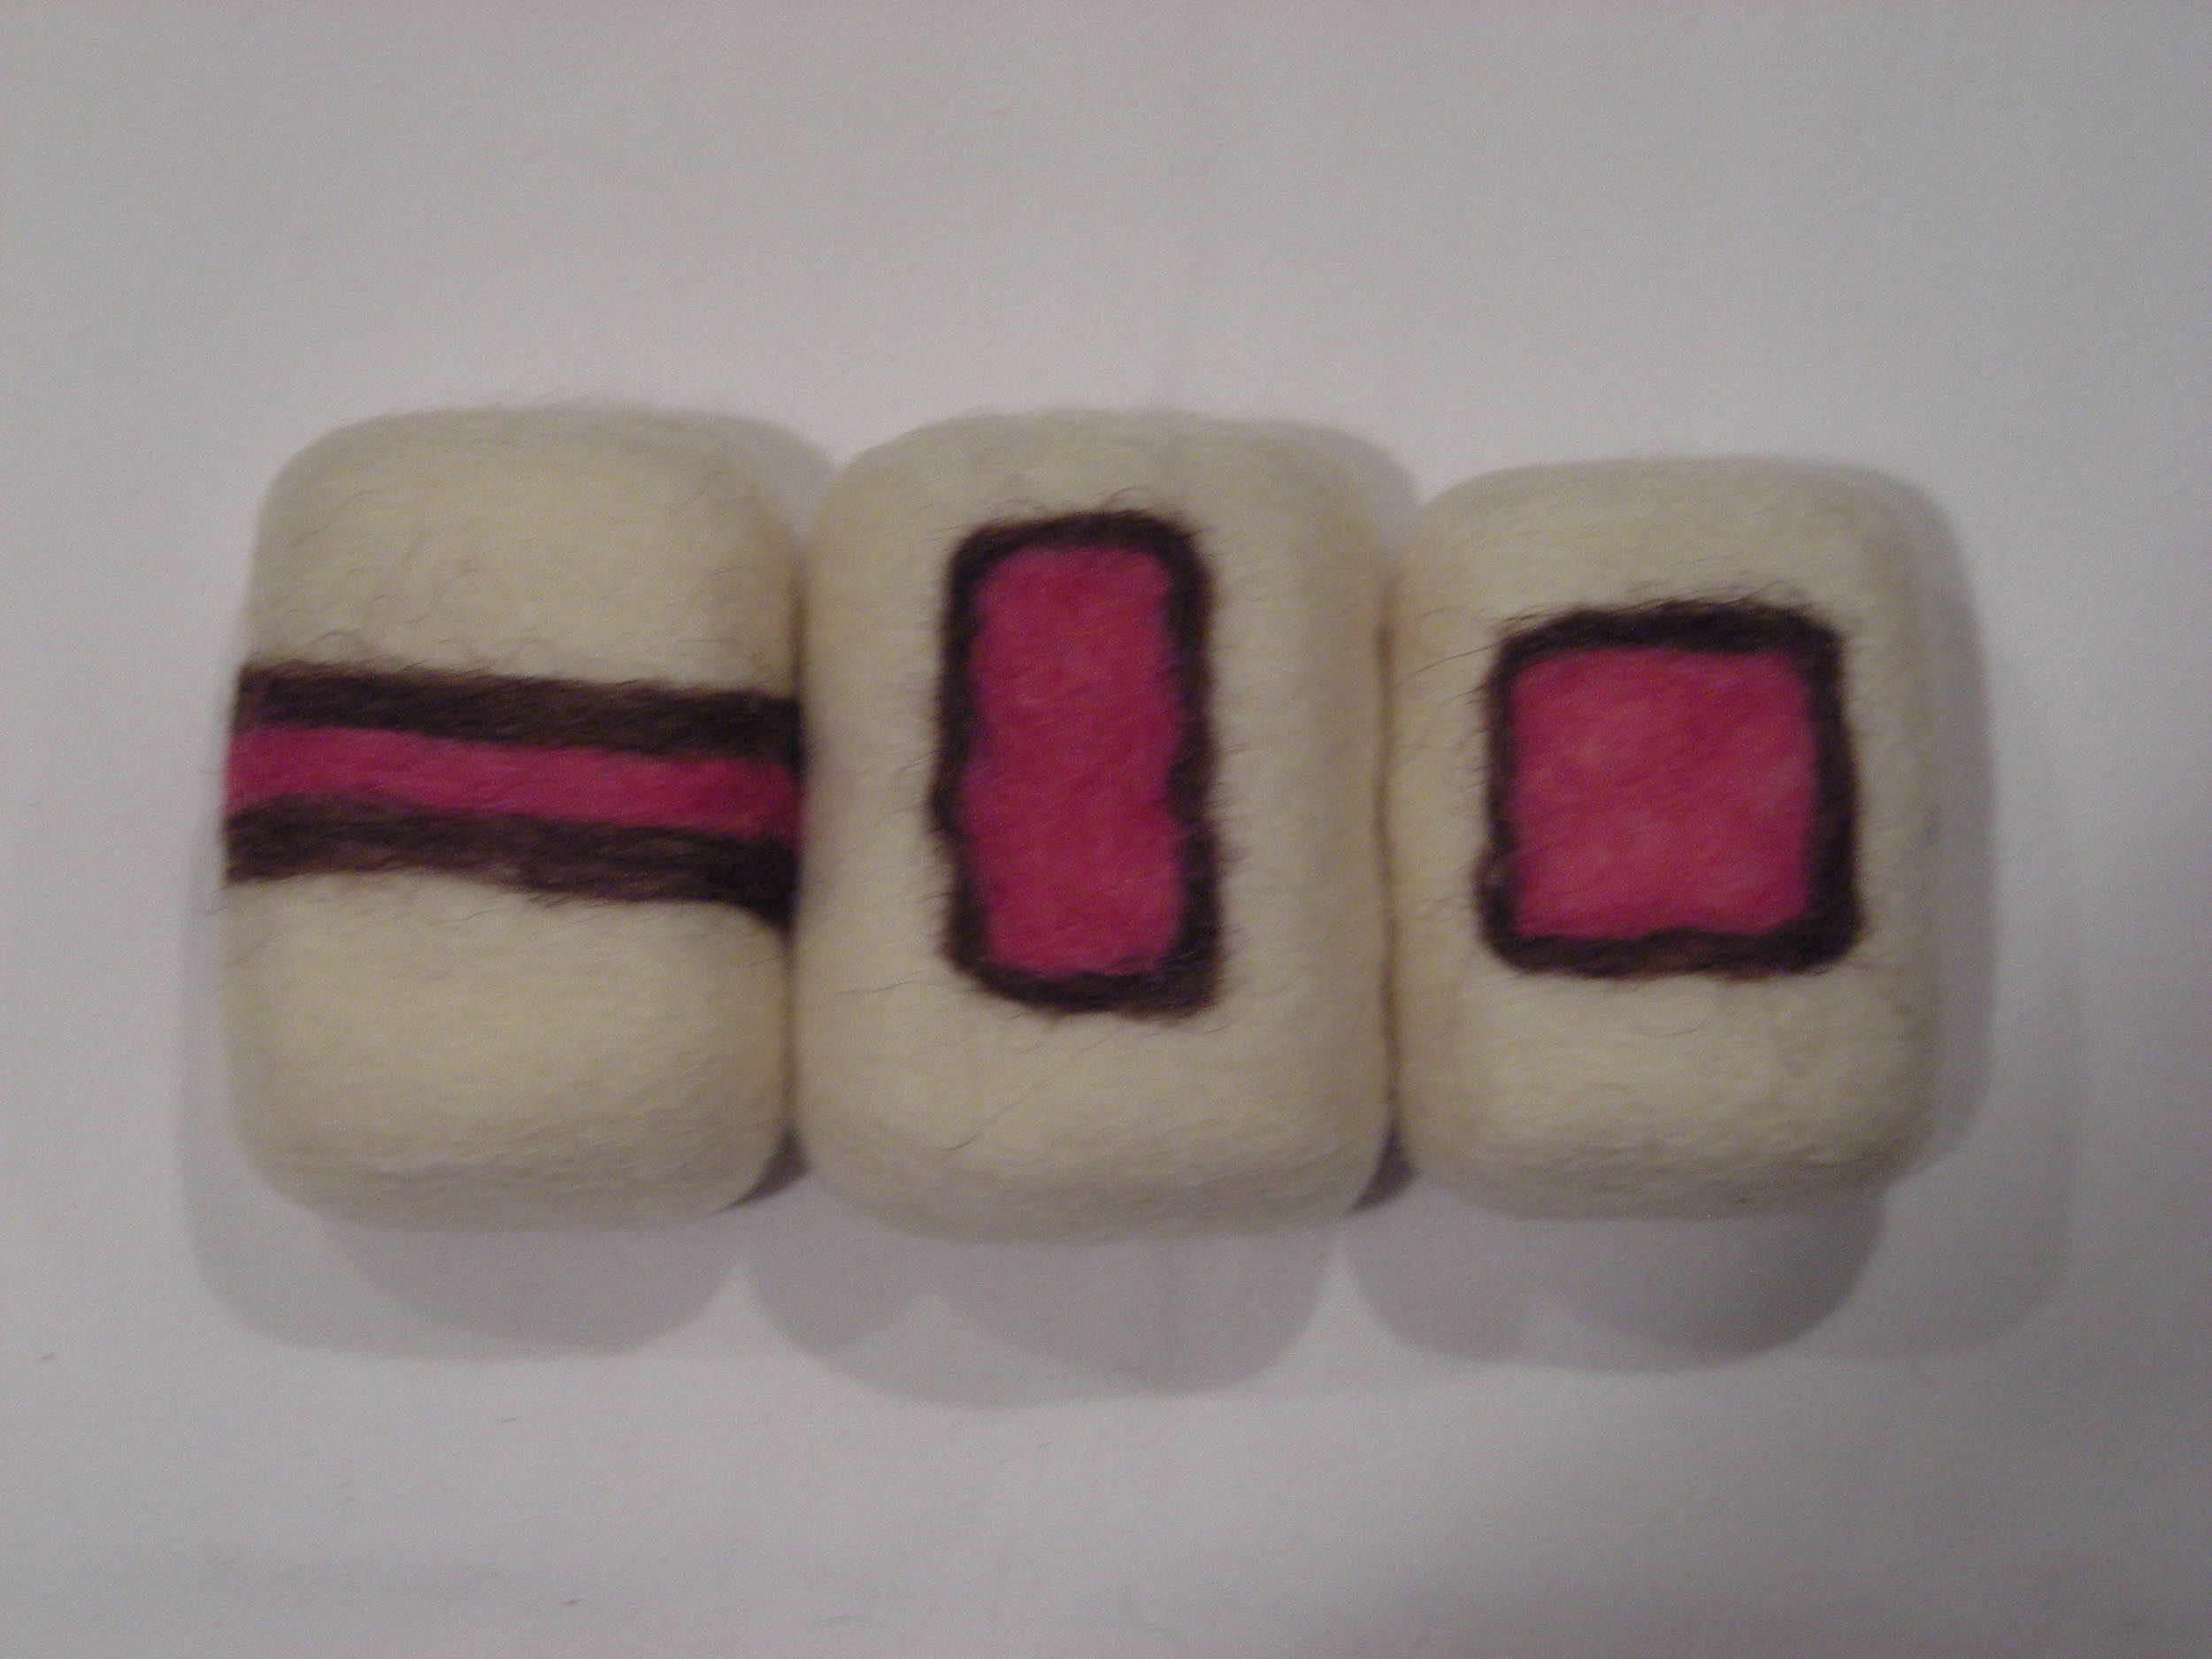 geometric soap design.JPG